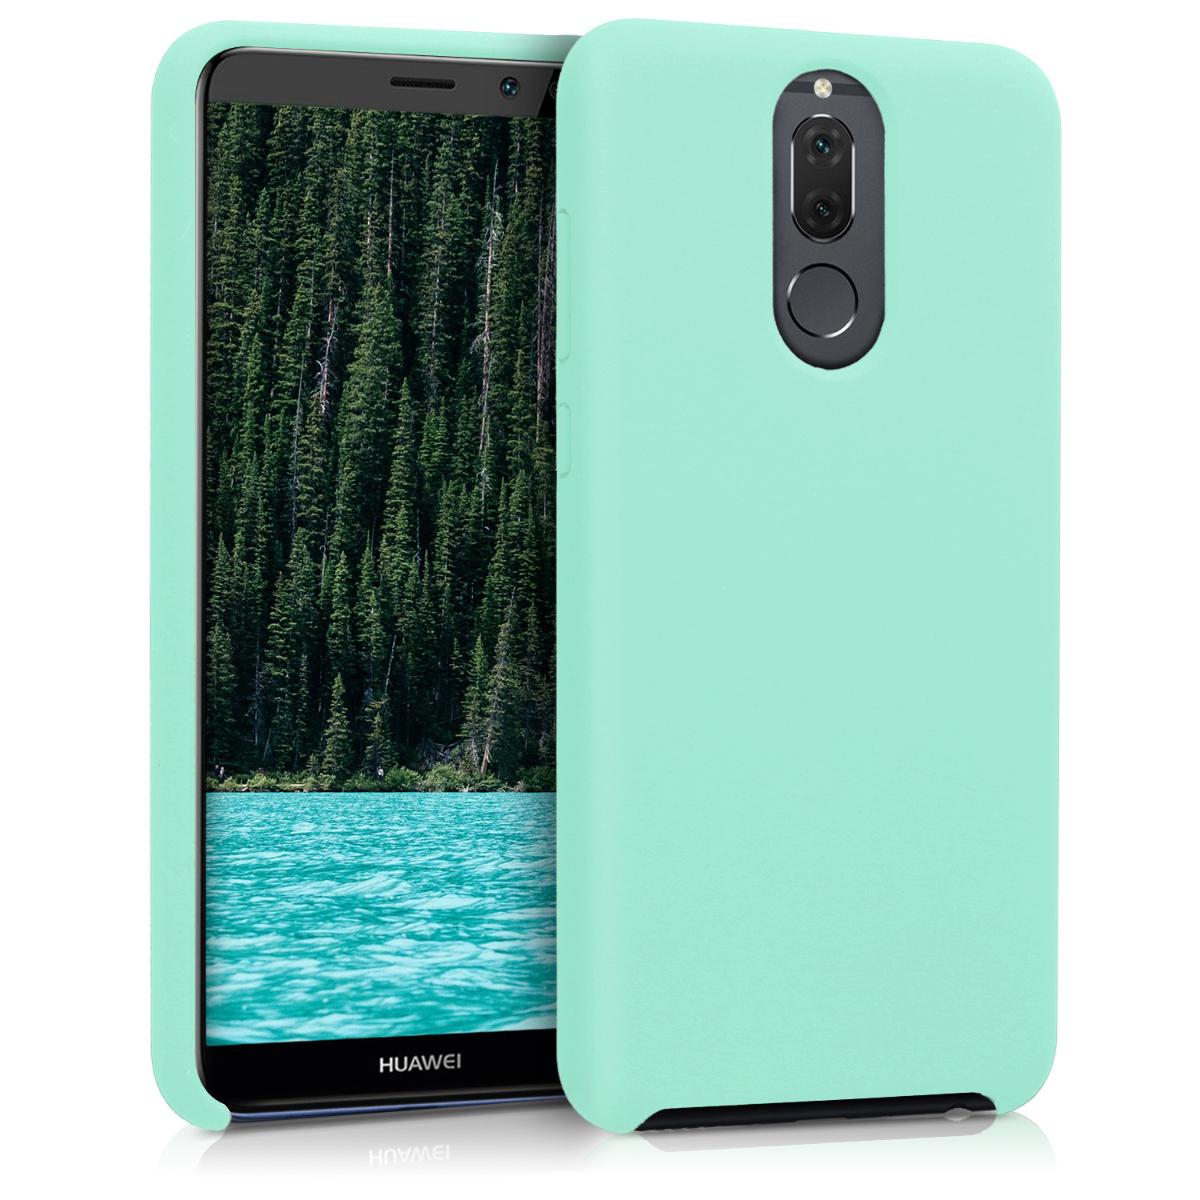 KW Θήκη Σιλικόνης Huawei Mate 10 Lite - Soft Flexible Rubber - Peppermint Green (43768.147)